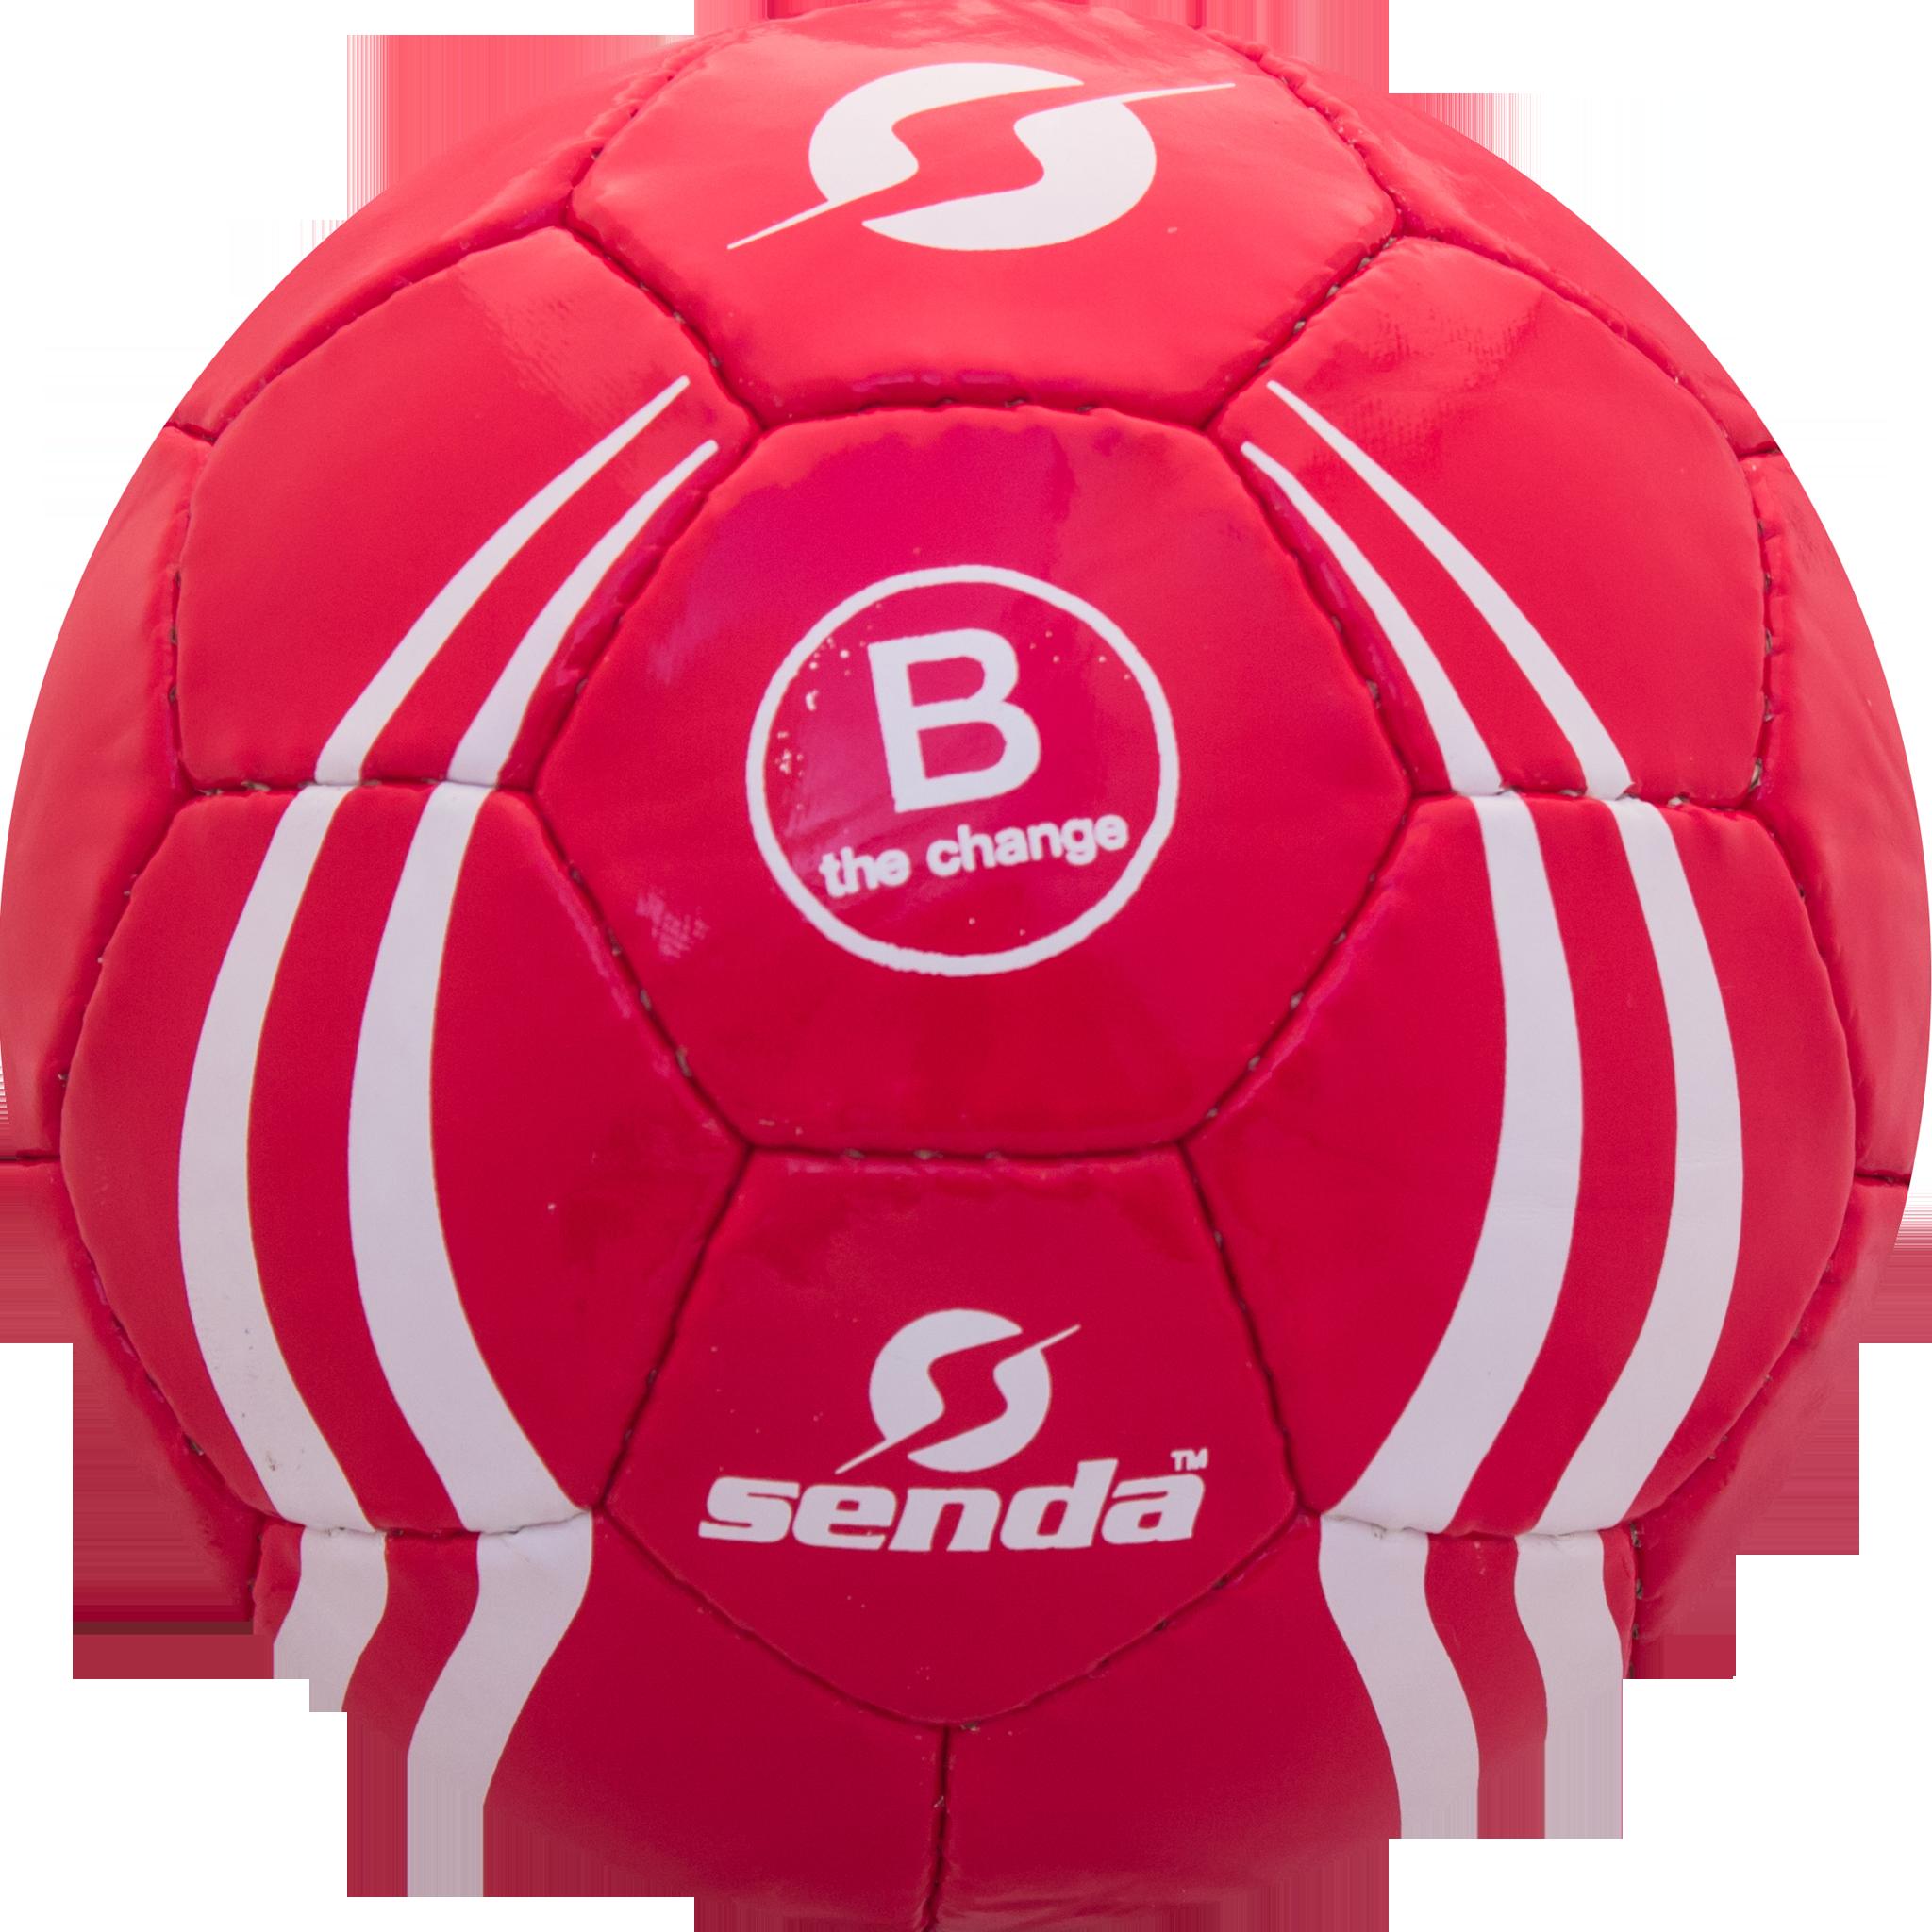 Baseball football soccer onesies clipart svg black and white library B Corporation Mini Soccer Ball   Products   Pinterest   Soccer ball ... svg black and white library